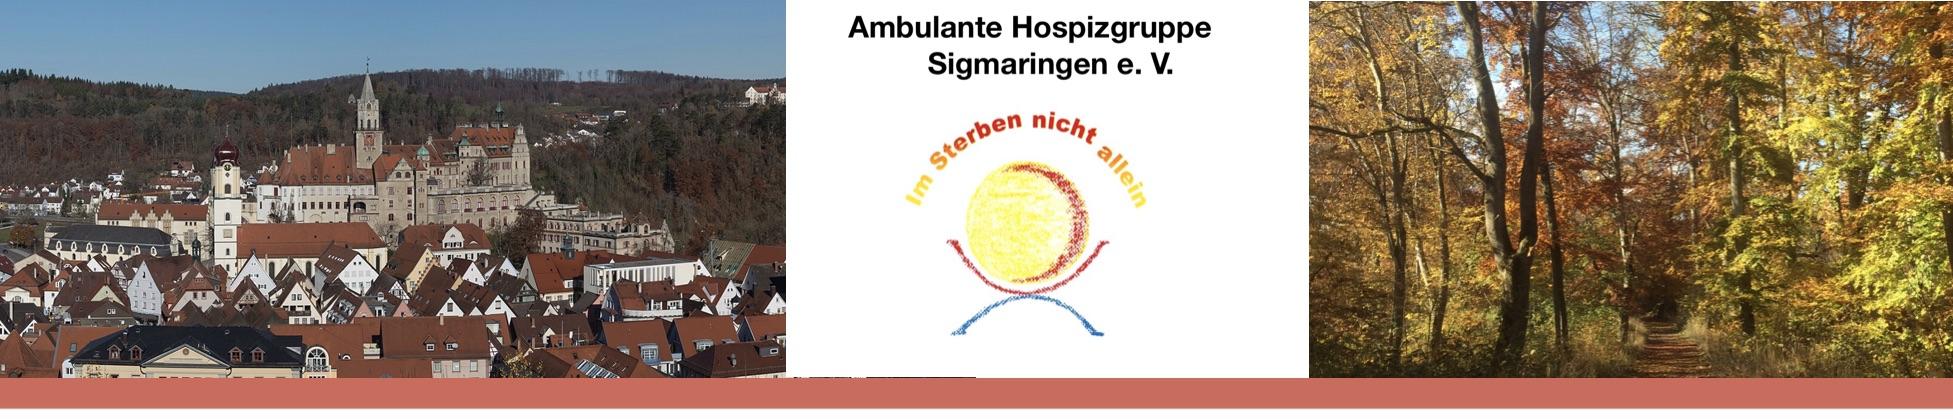 Ambulante Hospizgruppe Sigmaringen e.V.